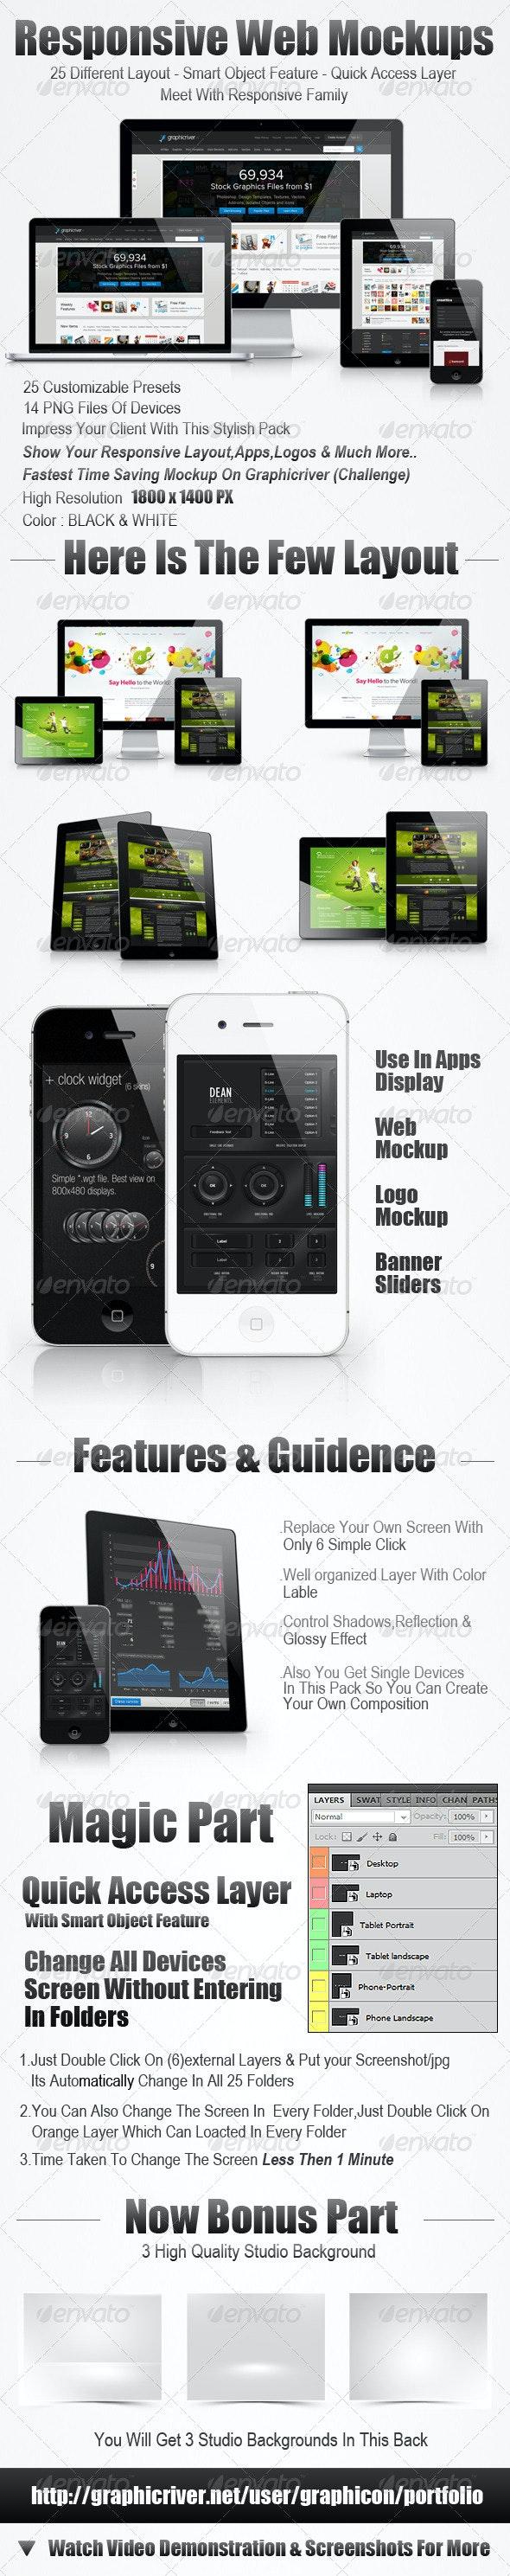 25 Ultimate Web Responsive Mockup Pack - Multiple Displays